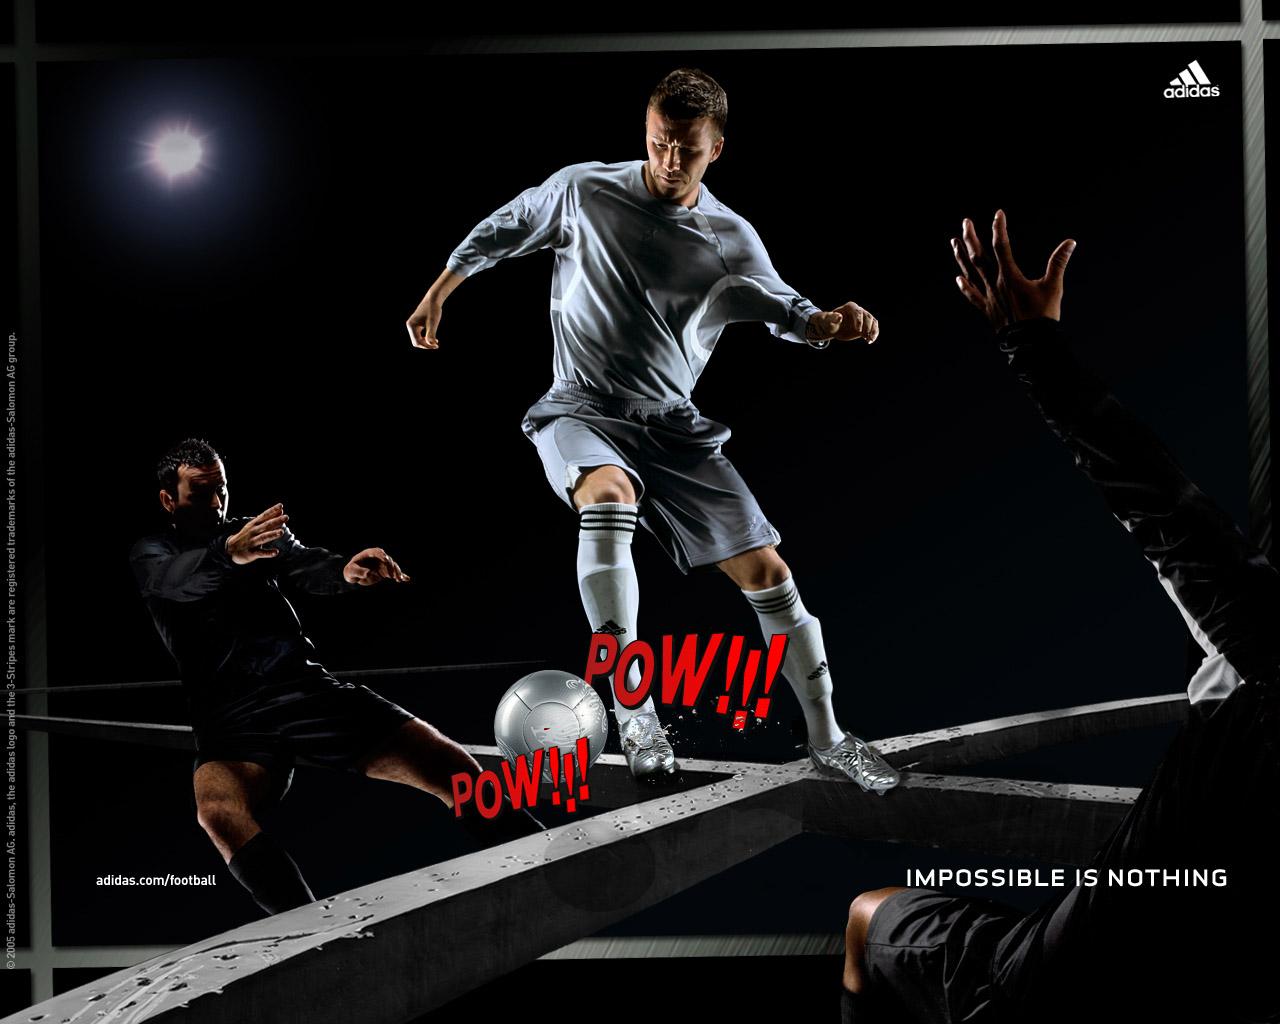 adidas american football quotes - photo #36